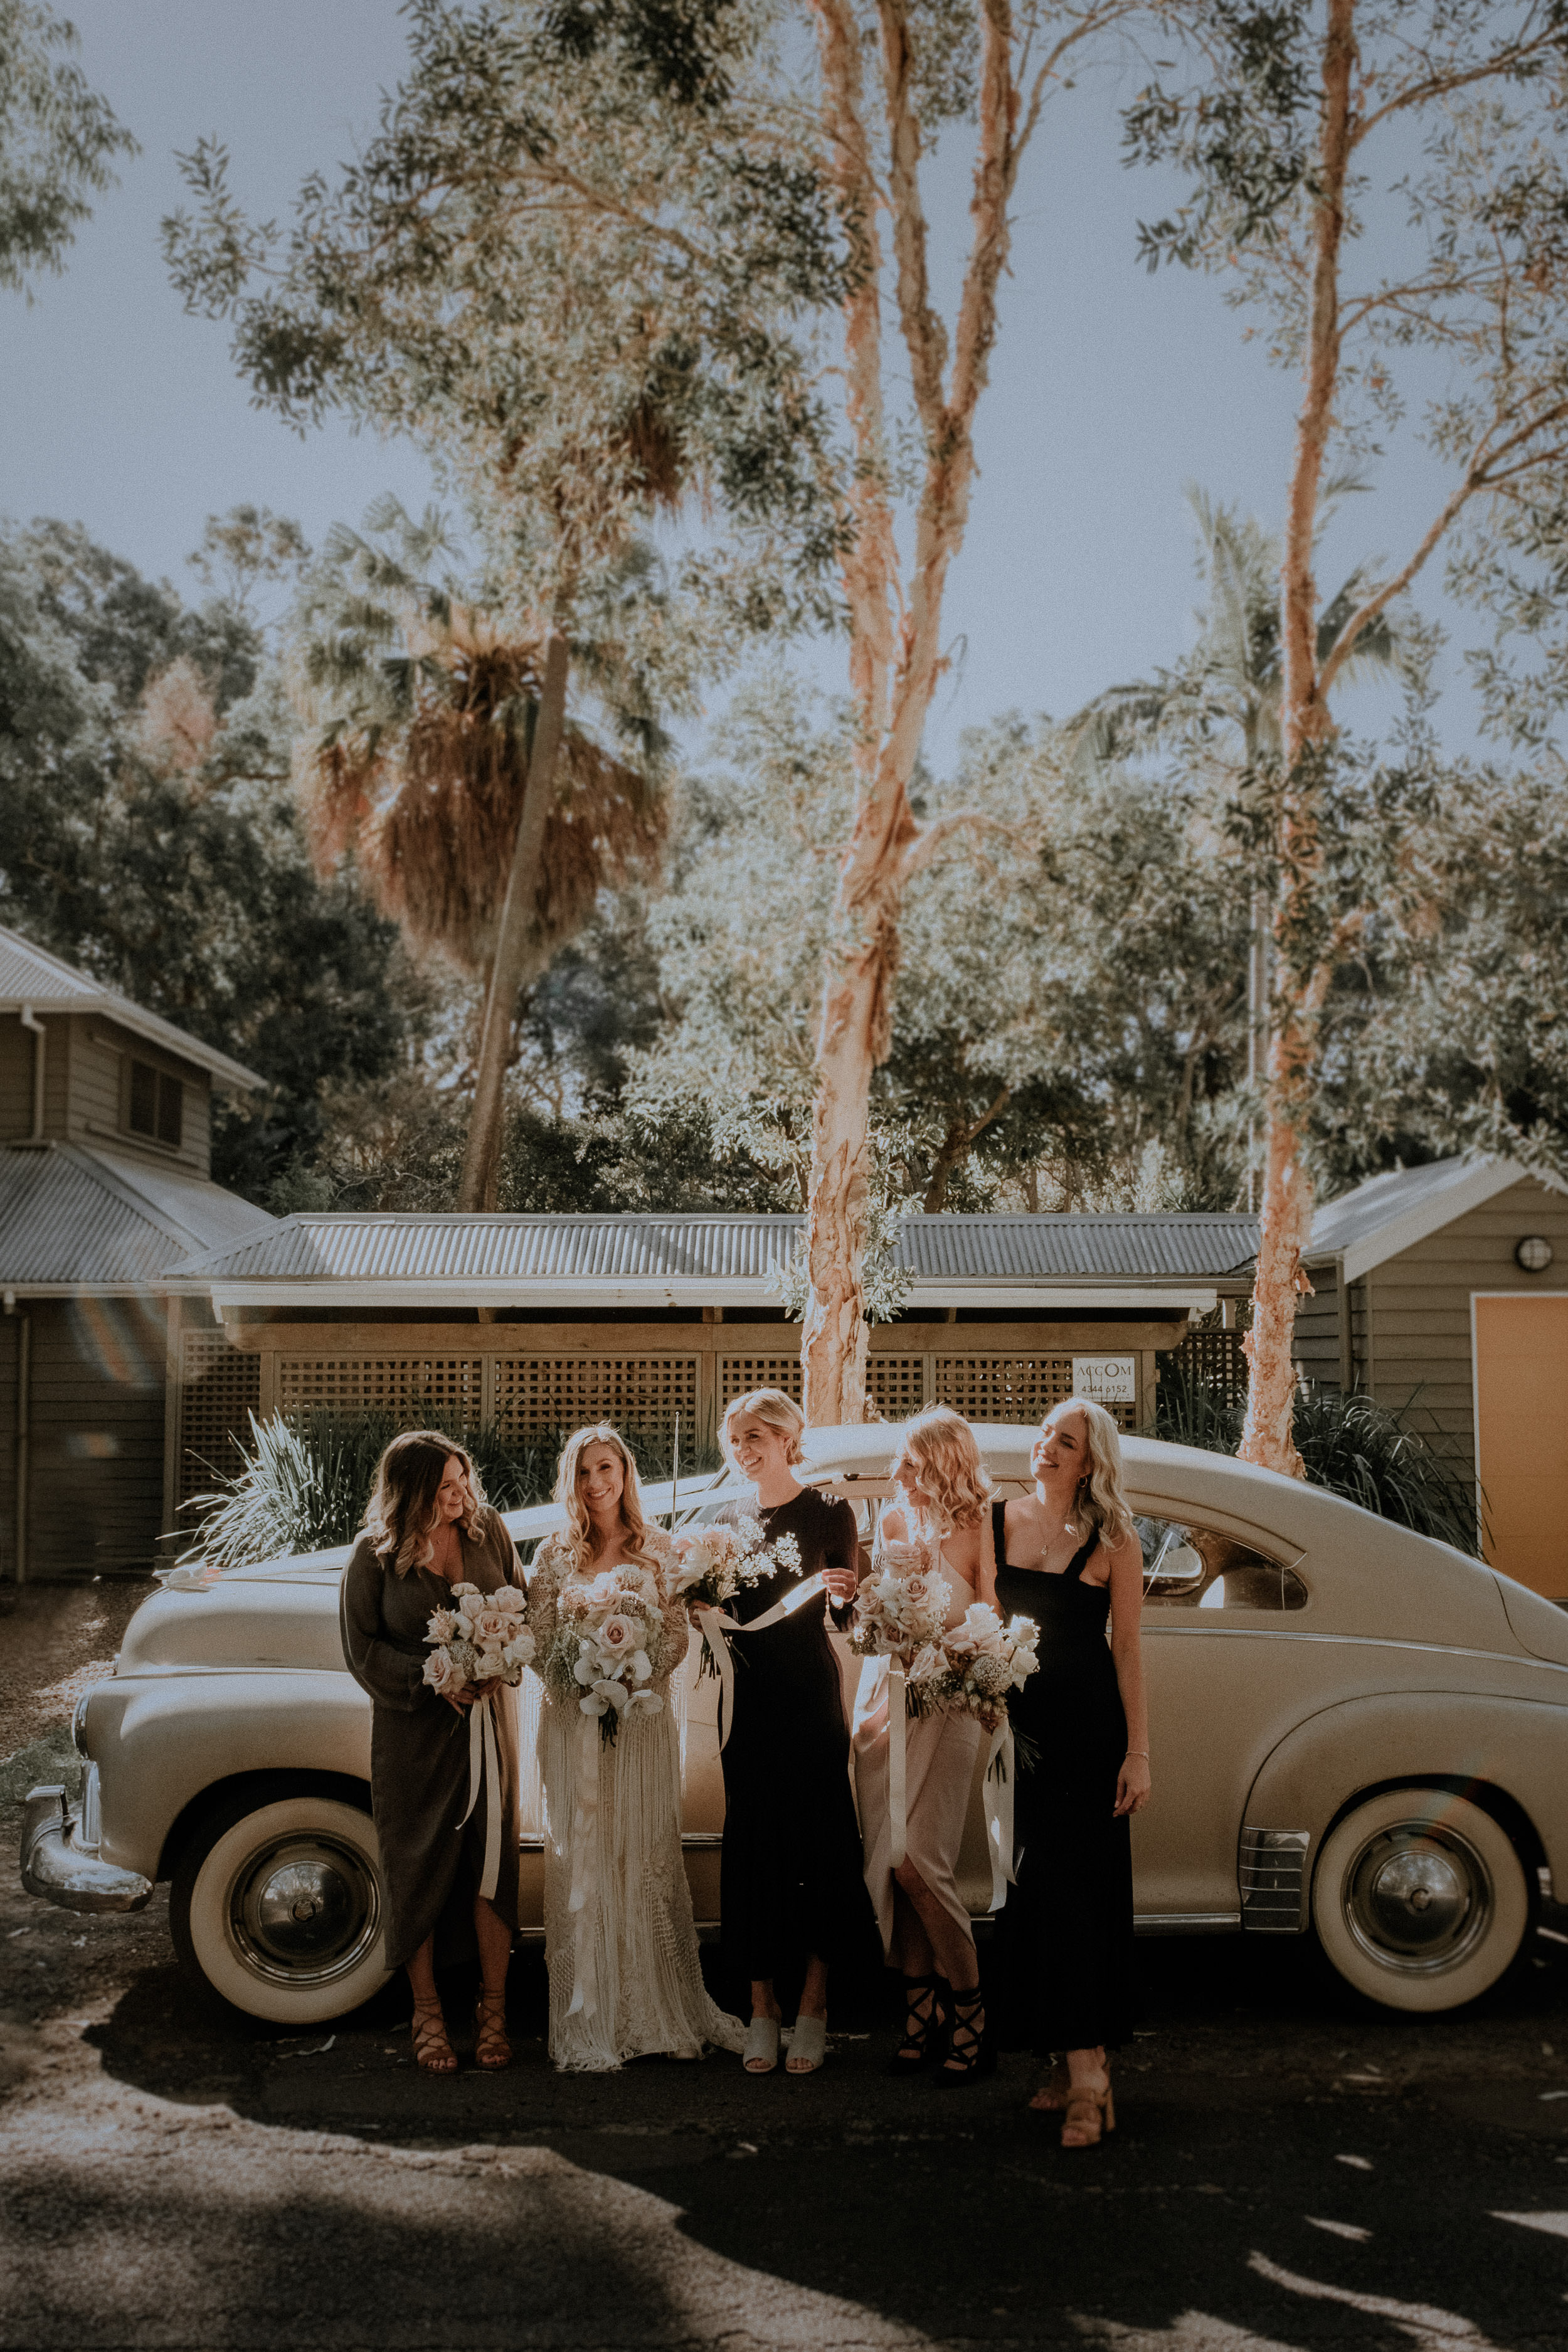 S&A Elopement - Kings & Thieves - Shred 'Til Dead - Central Coast Beach Forest Wedding - 124.jpg